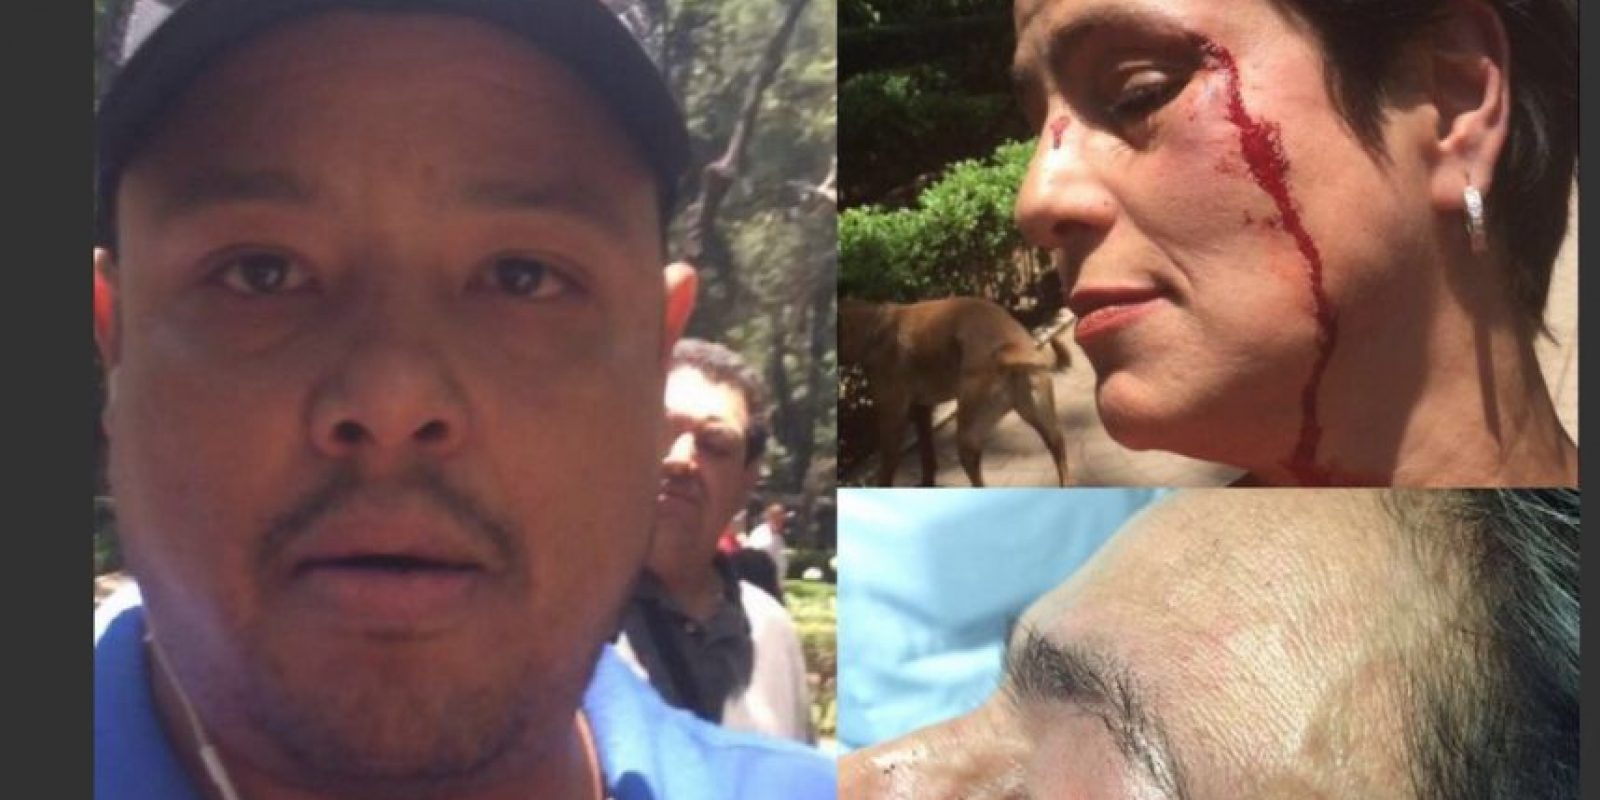 La actriz denunció ser golpeada por el sujeto Foto:twitter.com/americagabriell/